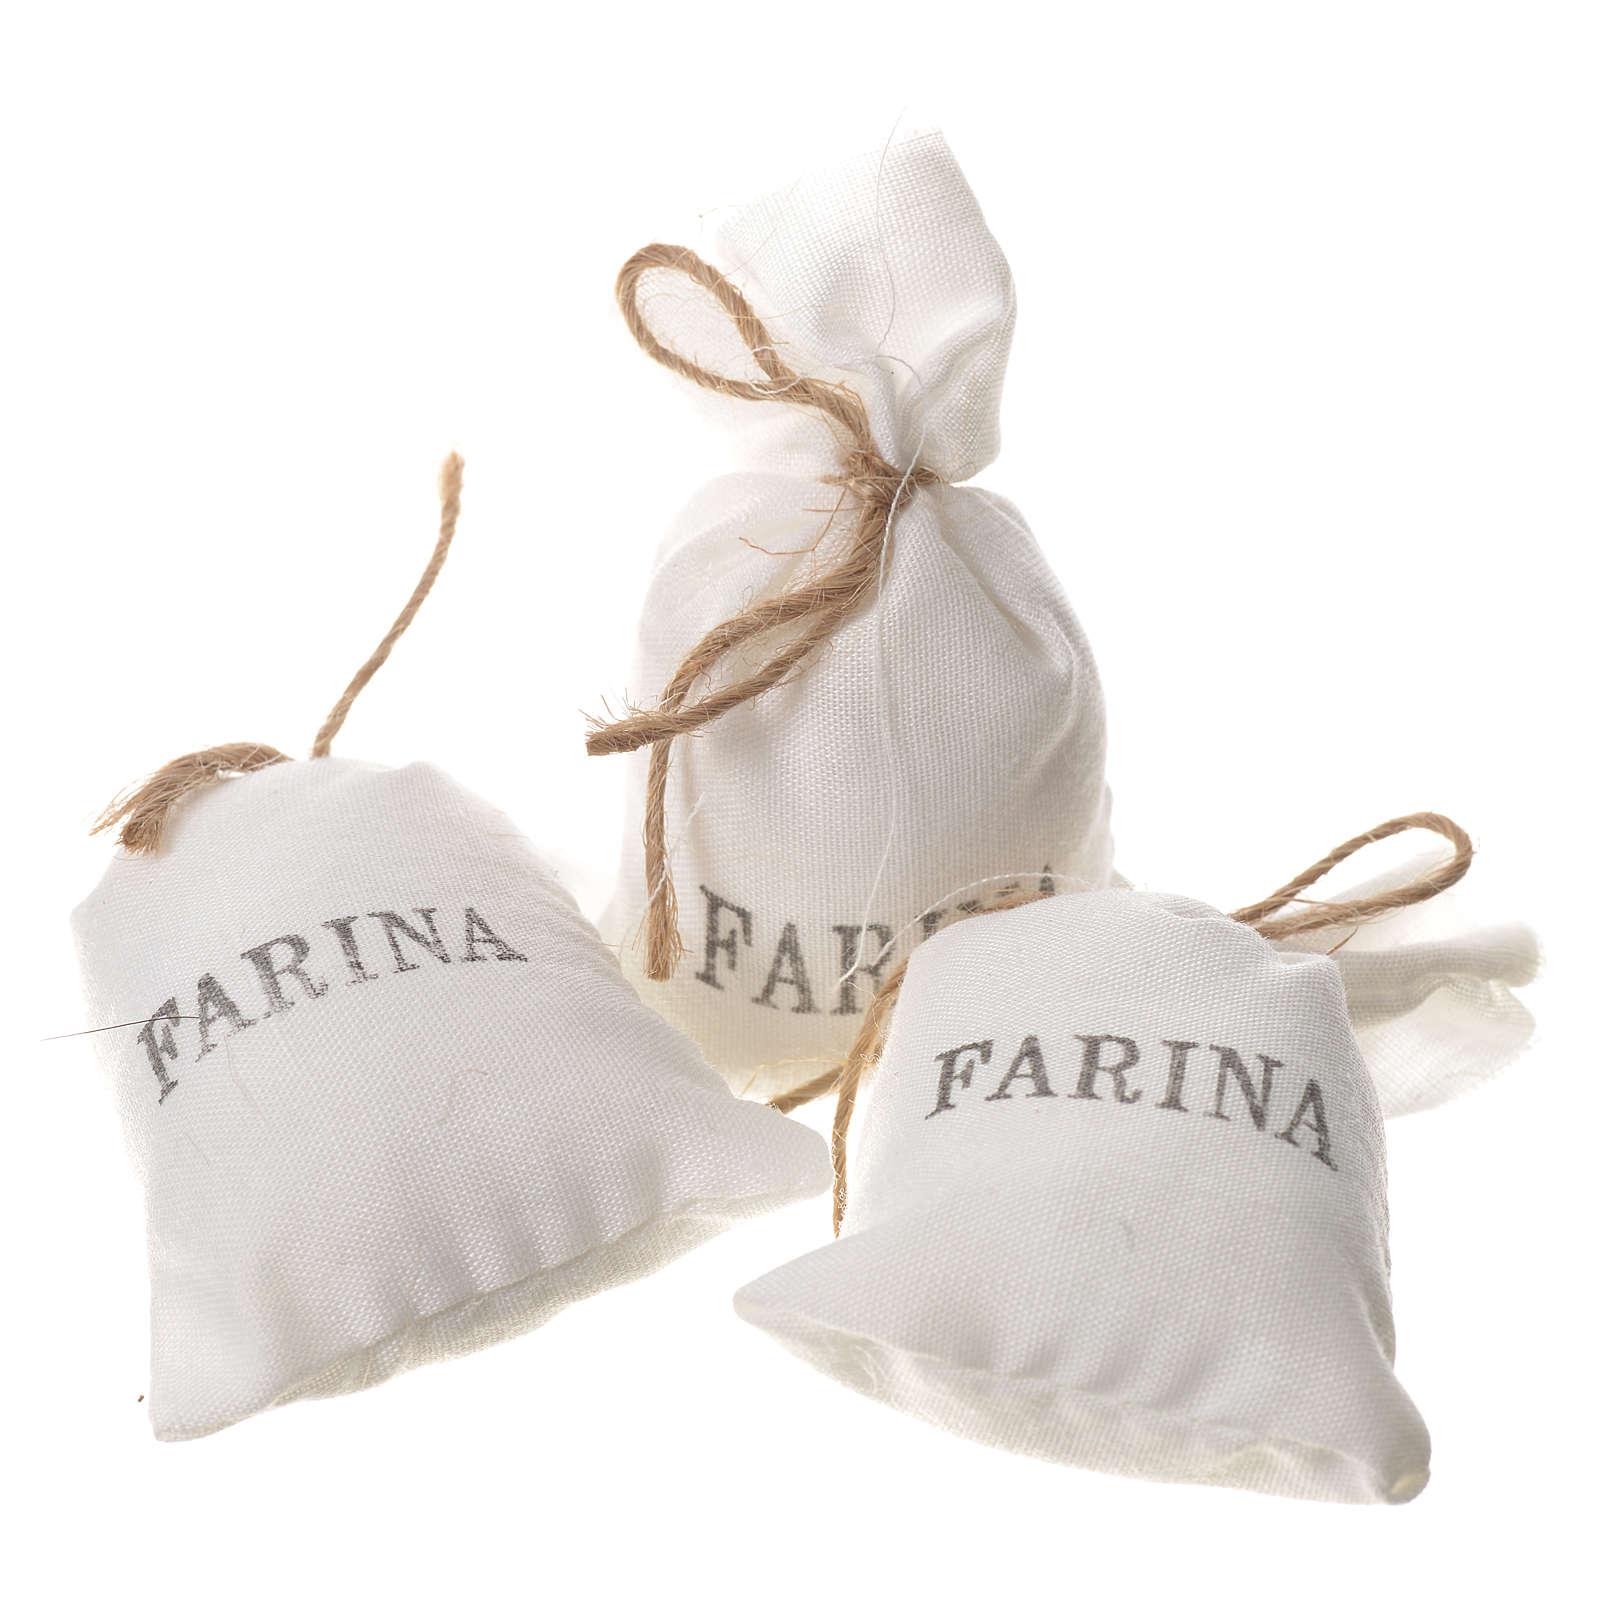 Bag of flour for nativities, 3pcs 7x3.5cm 4